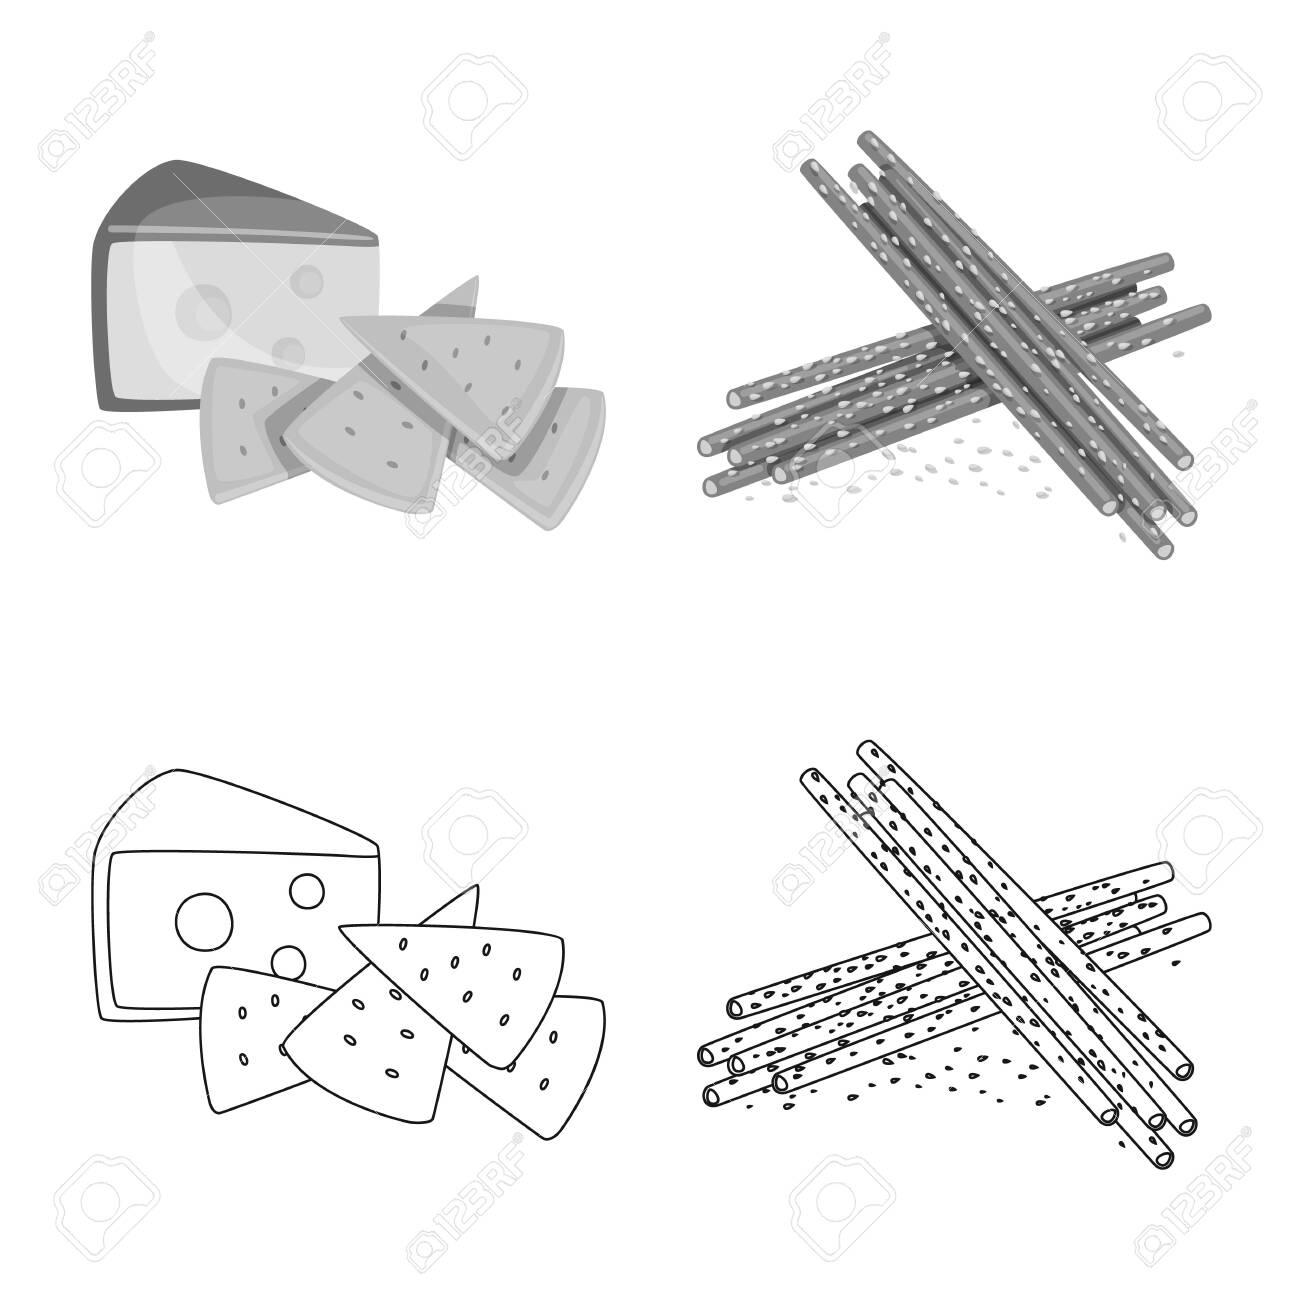 Vector design of taste and seasoning. Set of taste and organic stock vector illustration. - 143495756